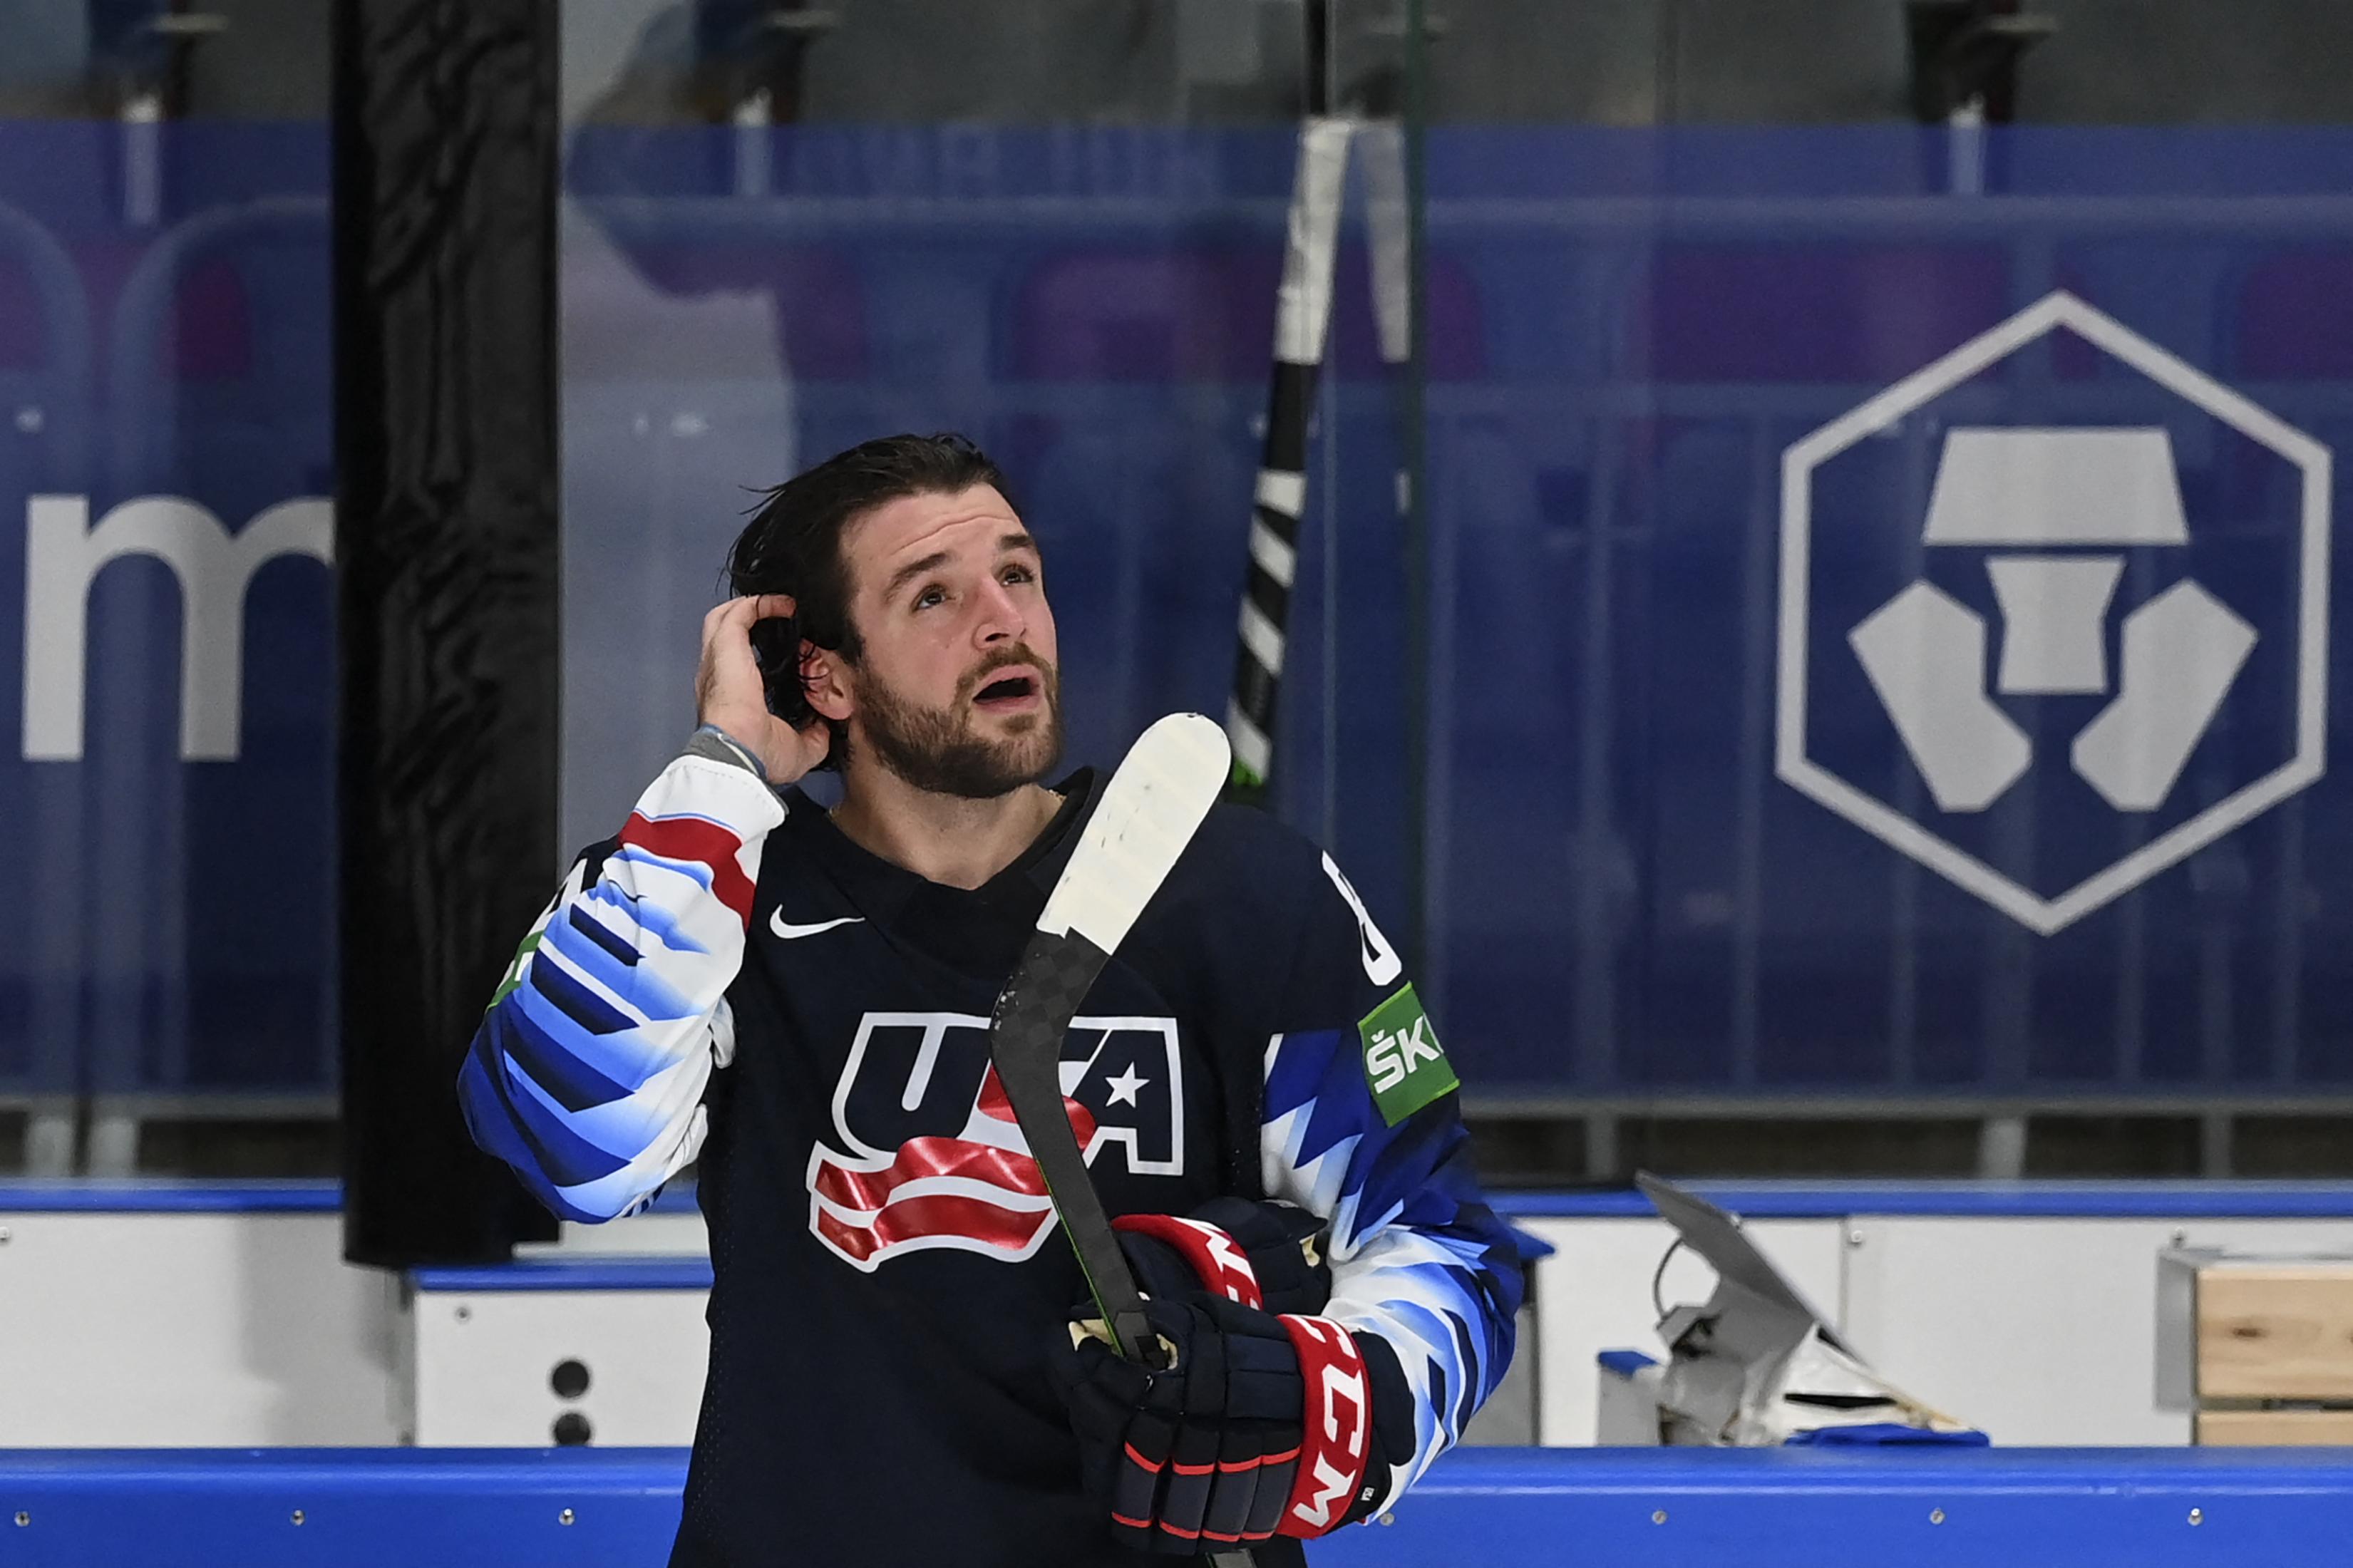 IHOCKEY-WC-IIHF-USA-CAN